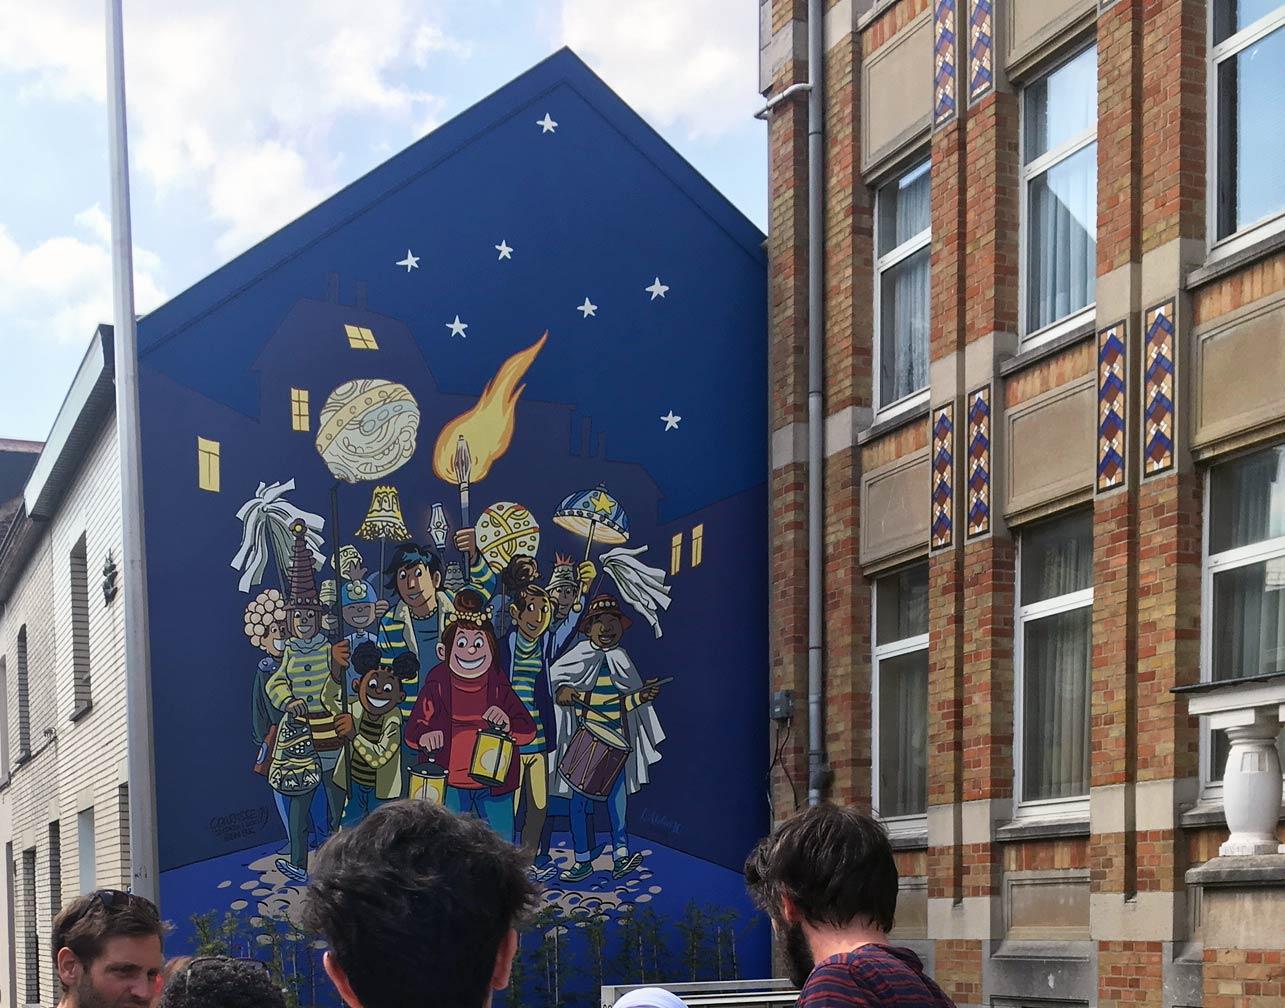 Une fresque Tamara à Bruxelles - 1